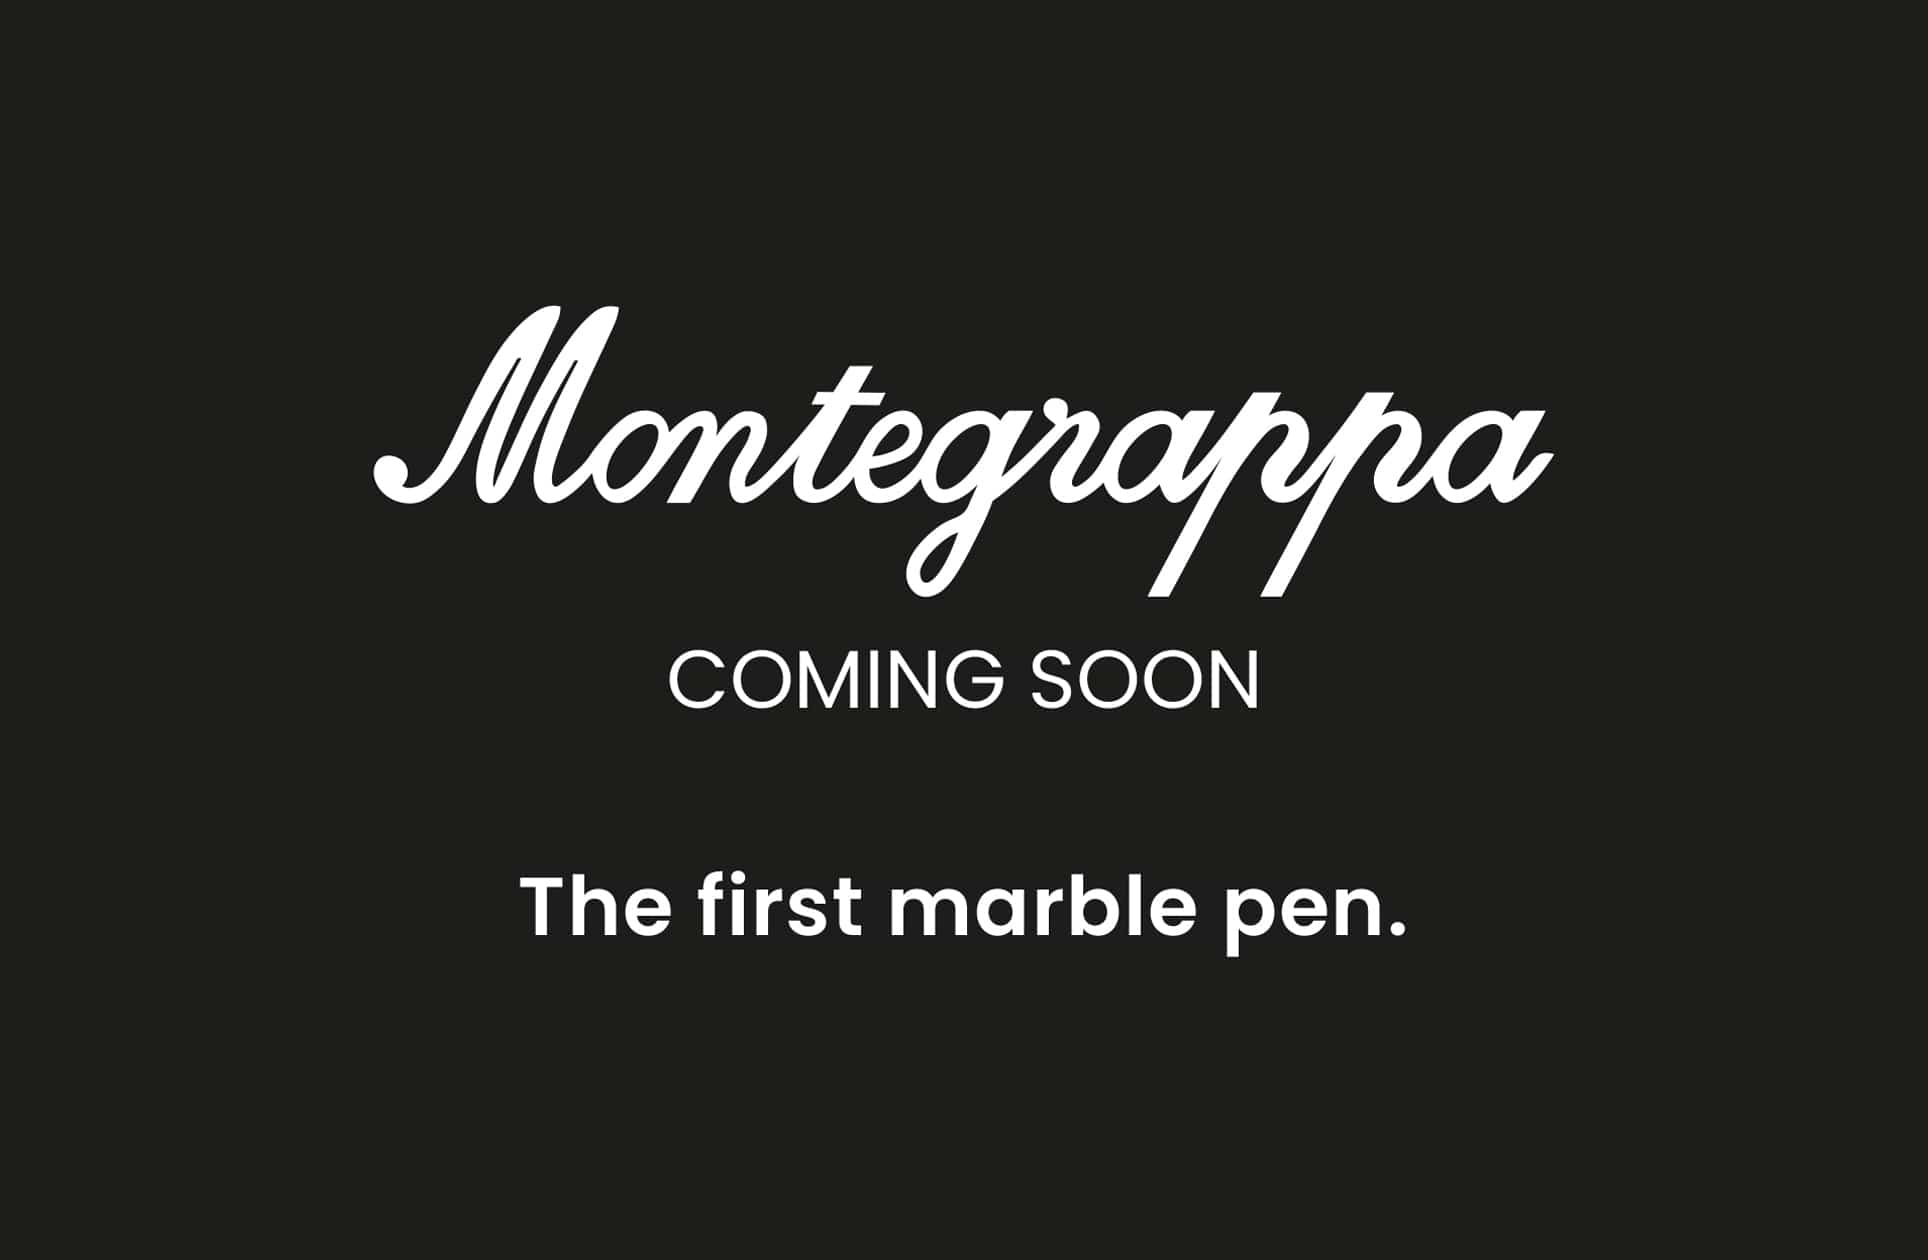 Penne Montegrappa